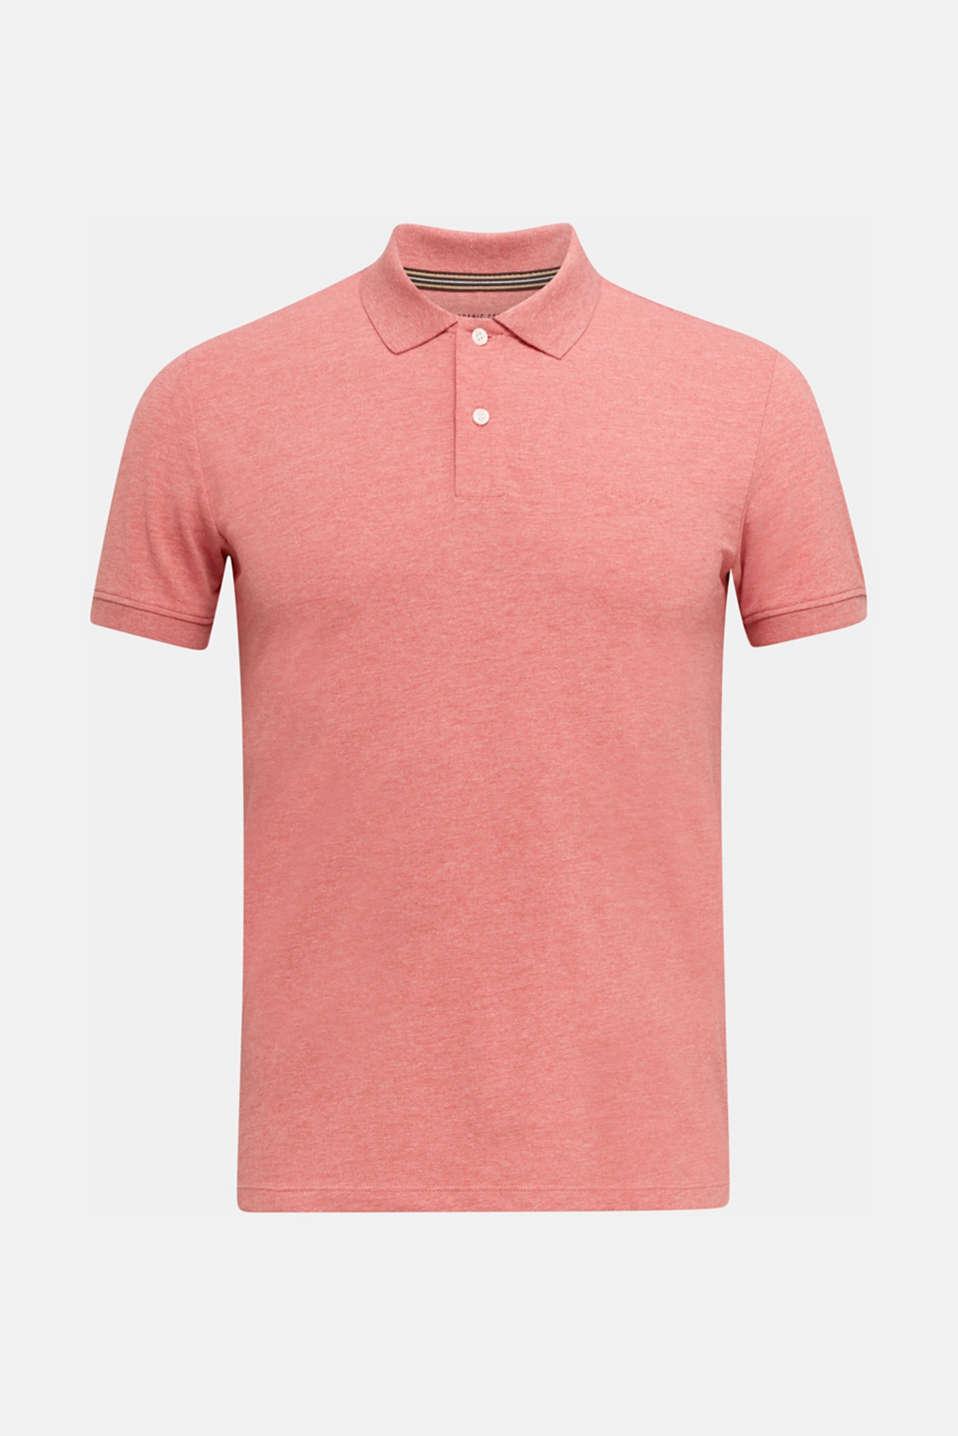 Melange piqué polo shirt, CORAL RED 5, detail image number 5